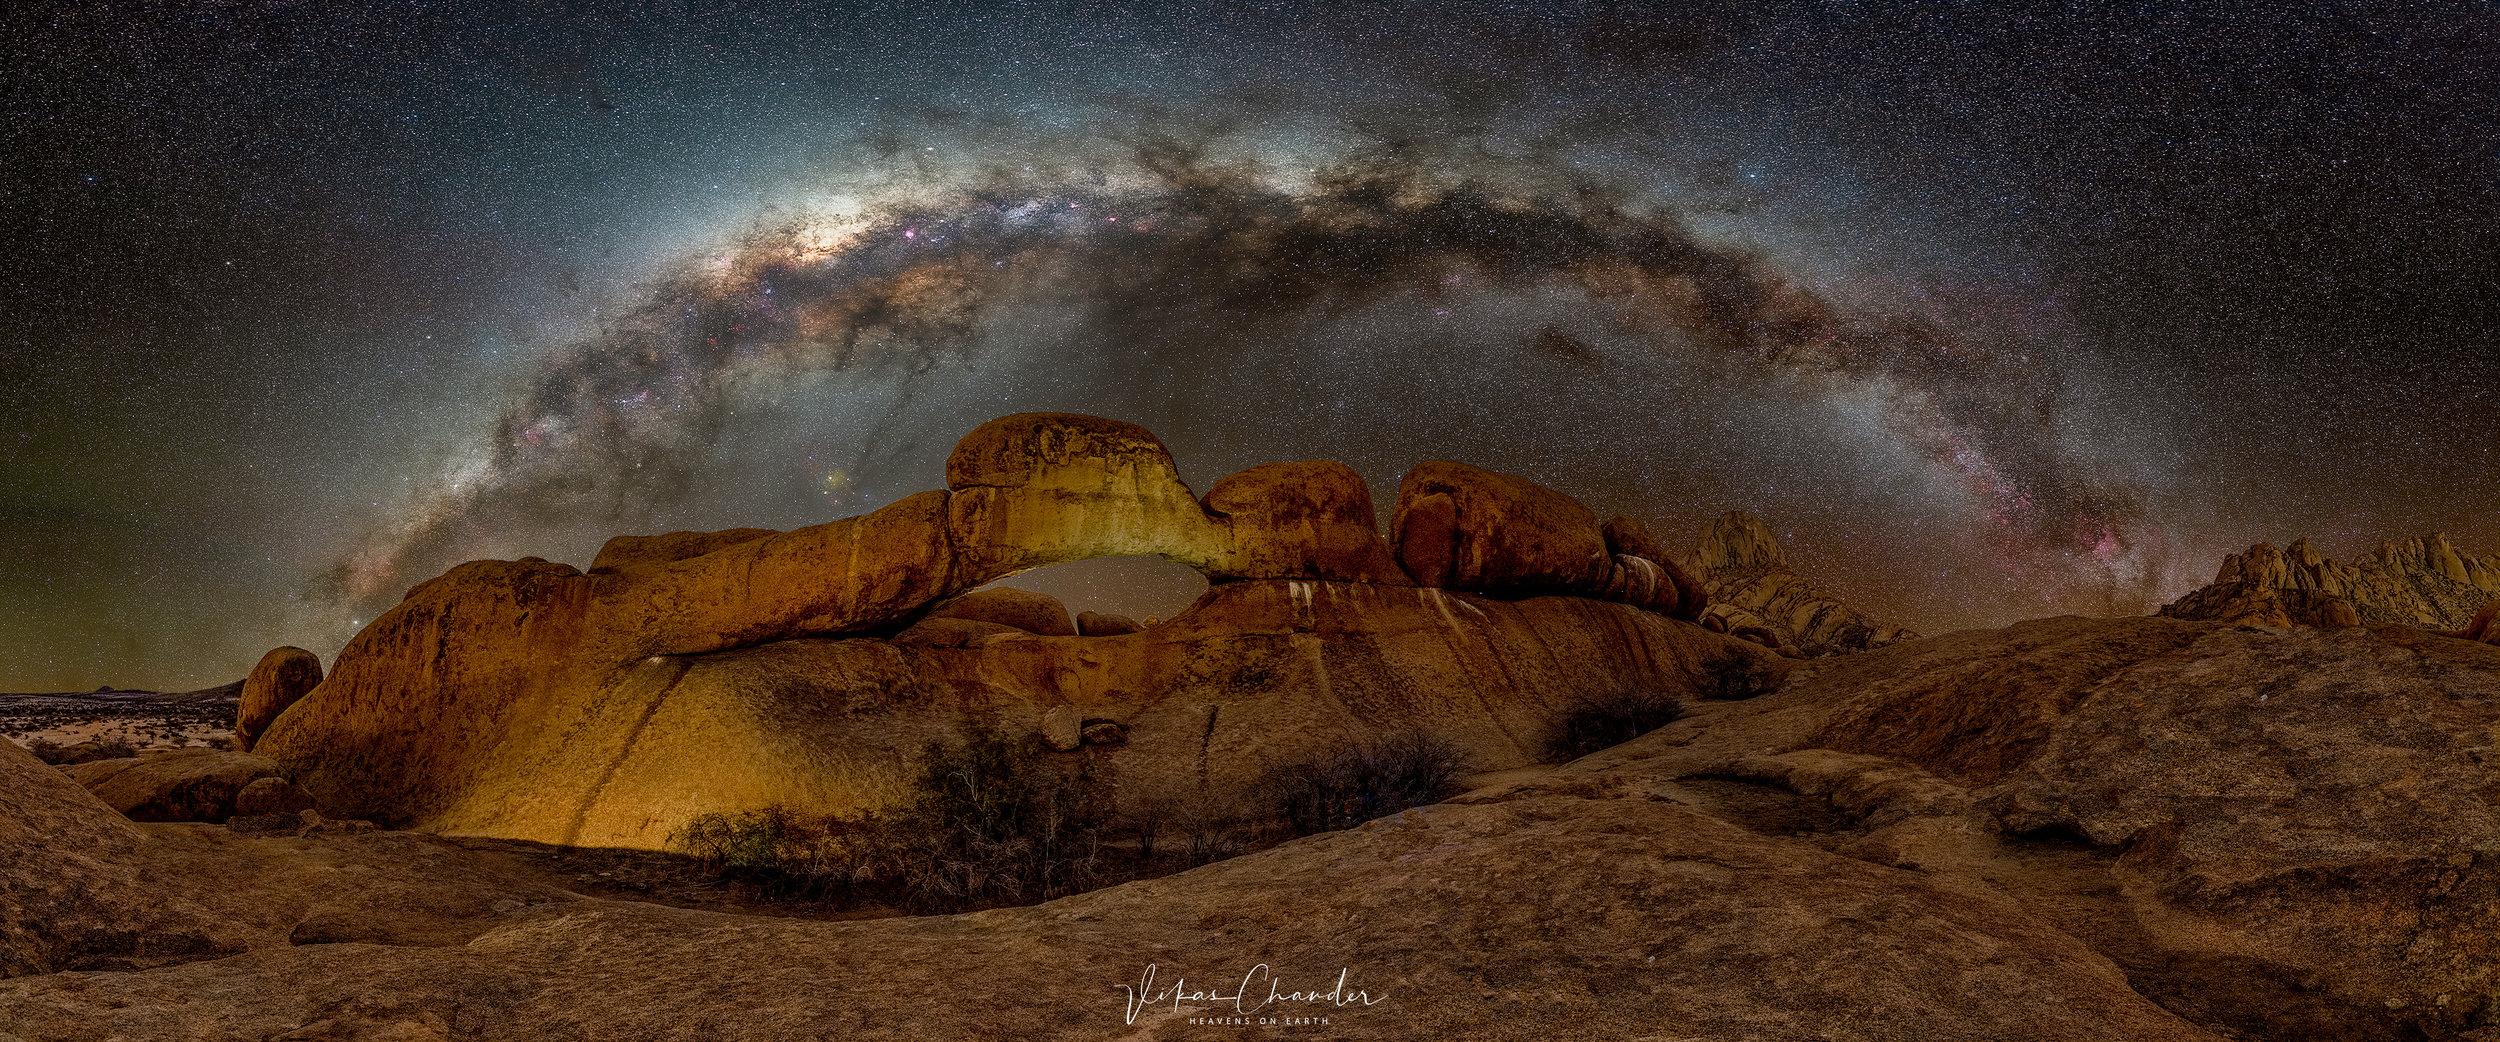 180909-0028-d850c-spitzkoppe-panorama.jpg